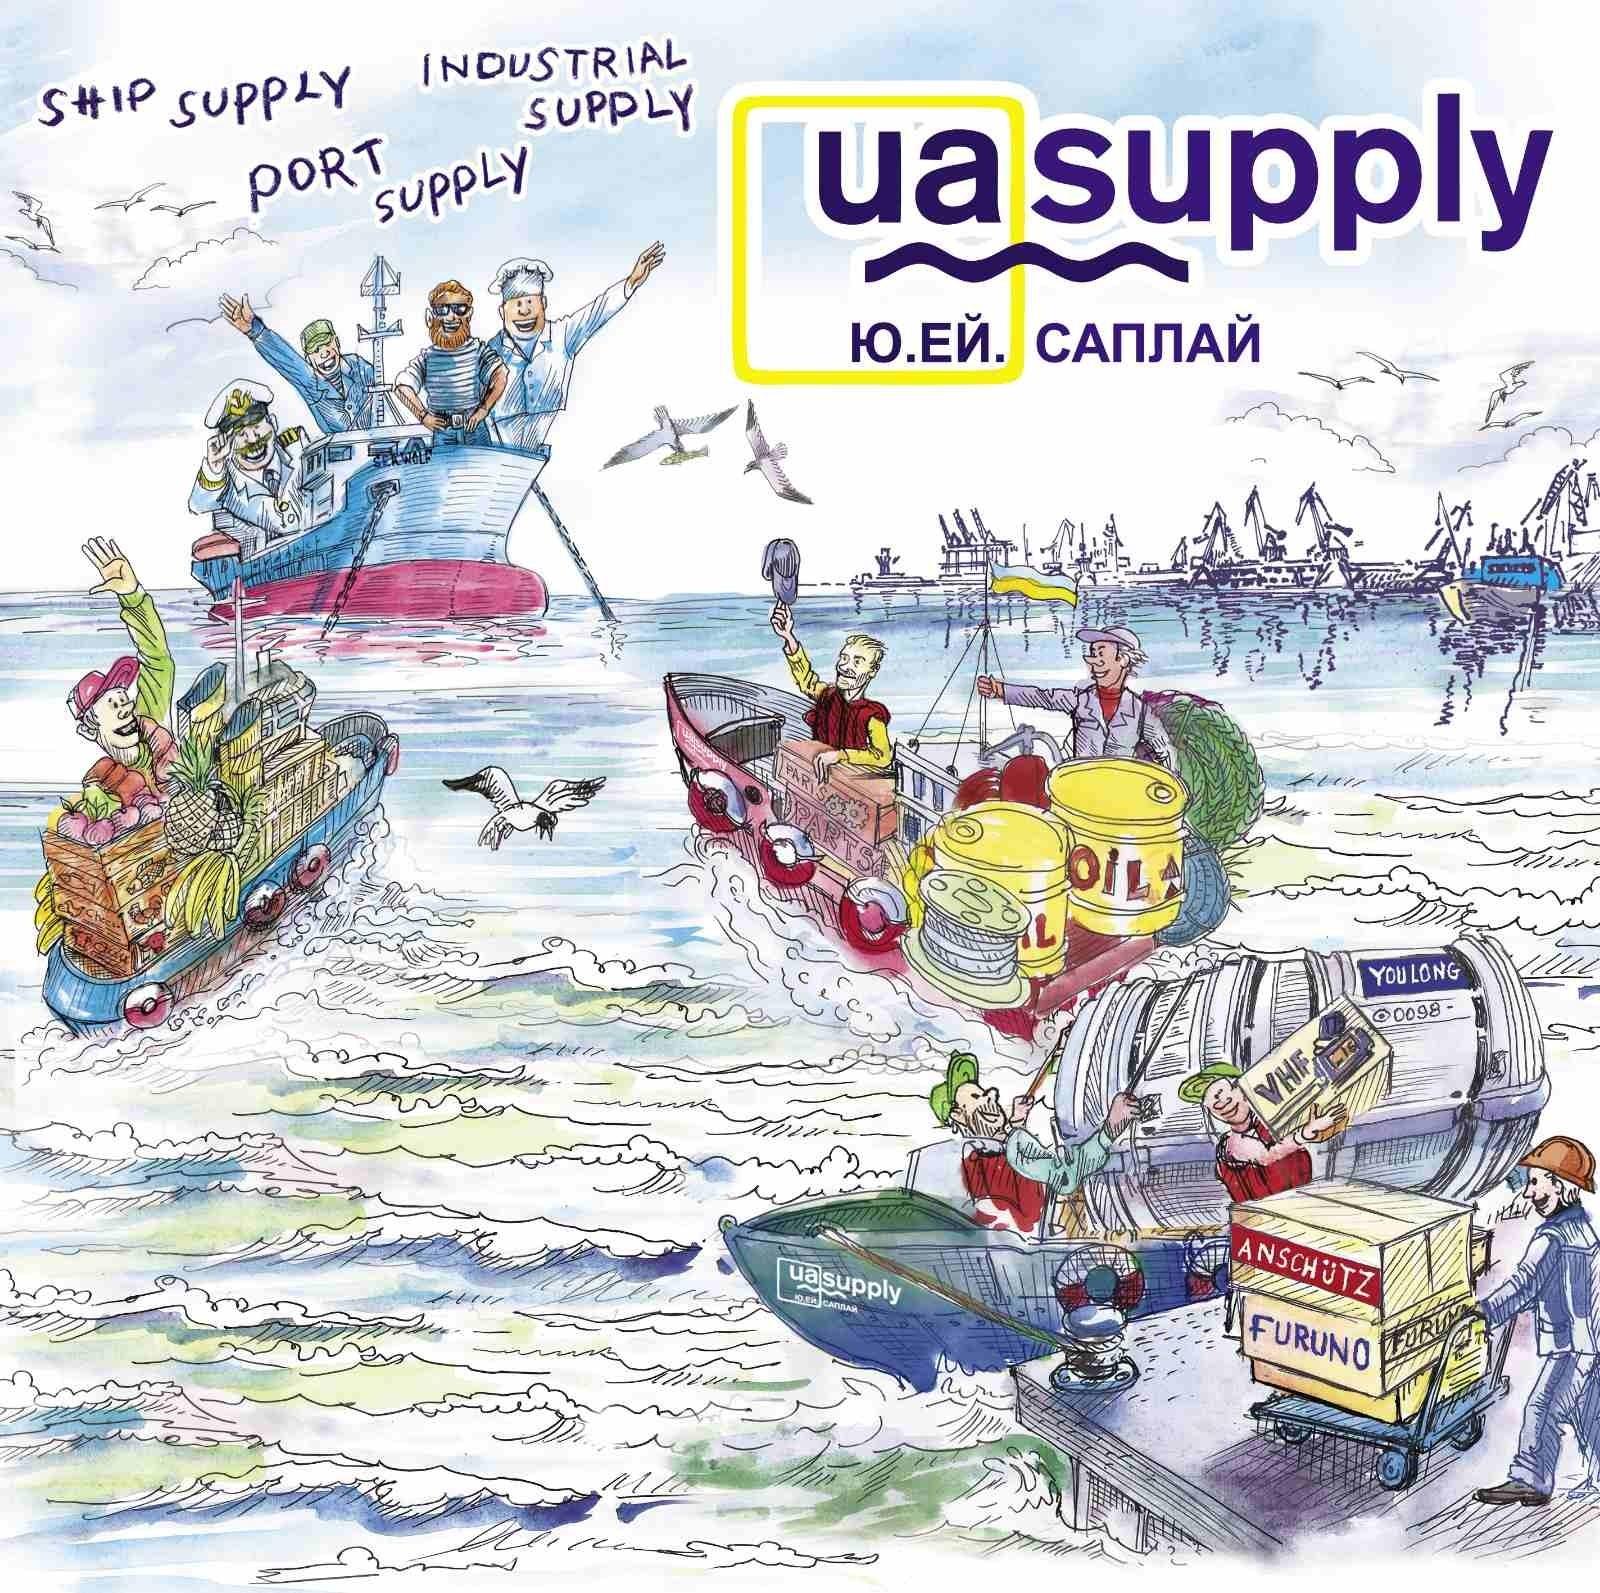 UA SUPPLY LTD